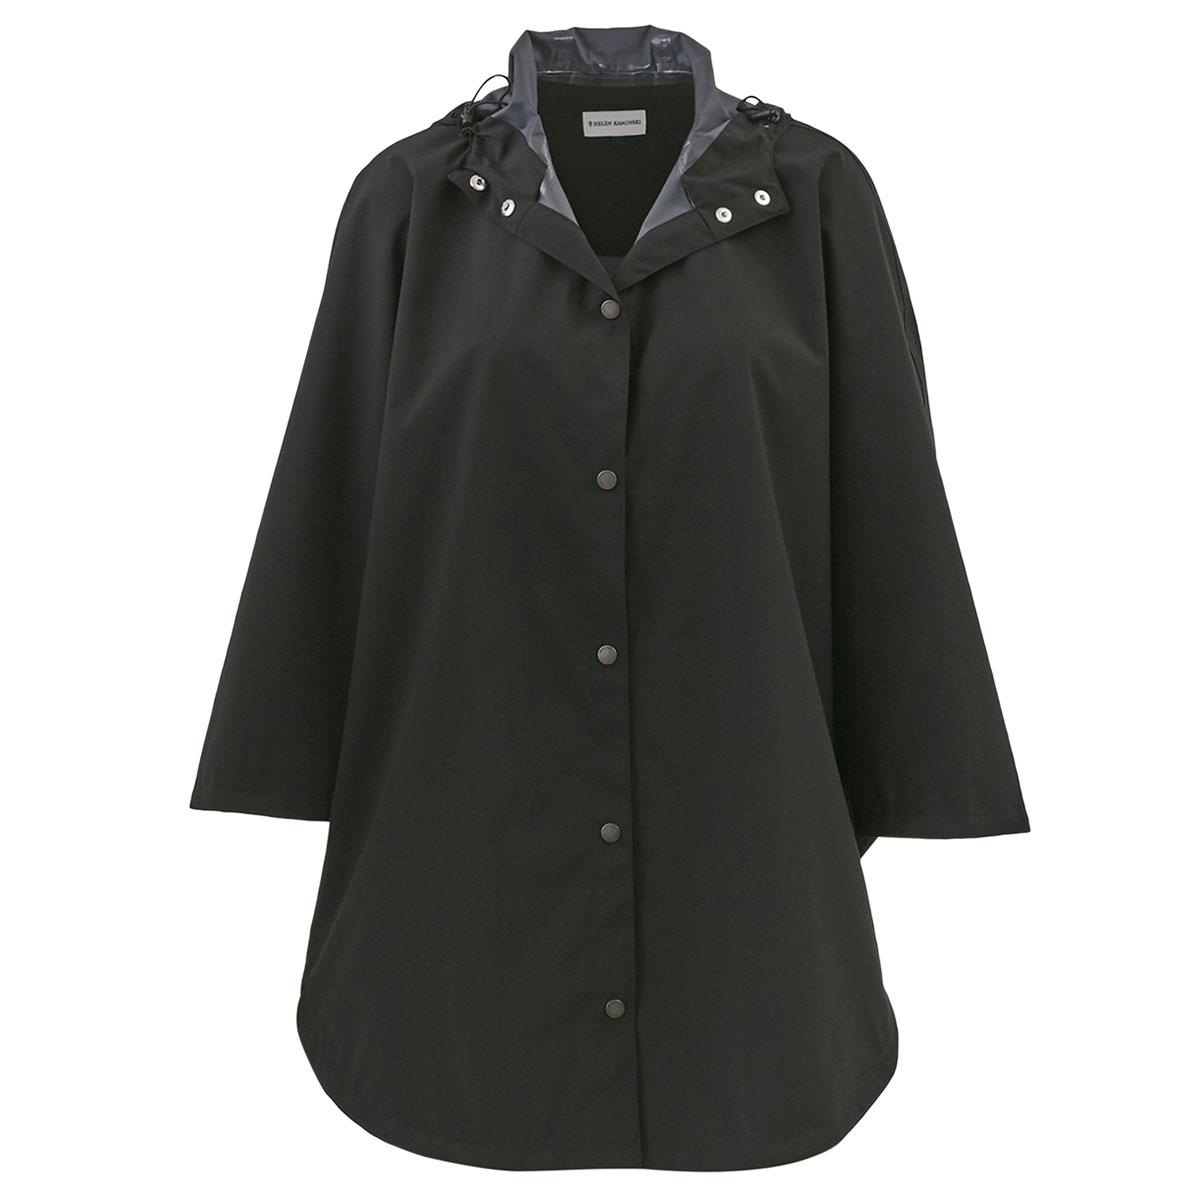 Helen Kaminski Mya Jacket in Black